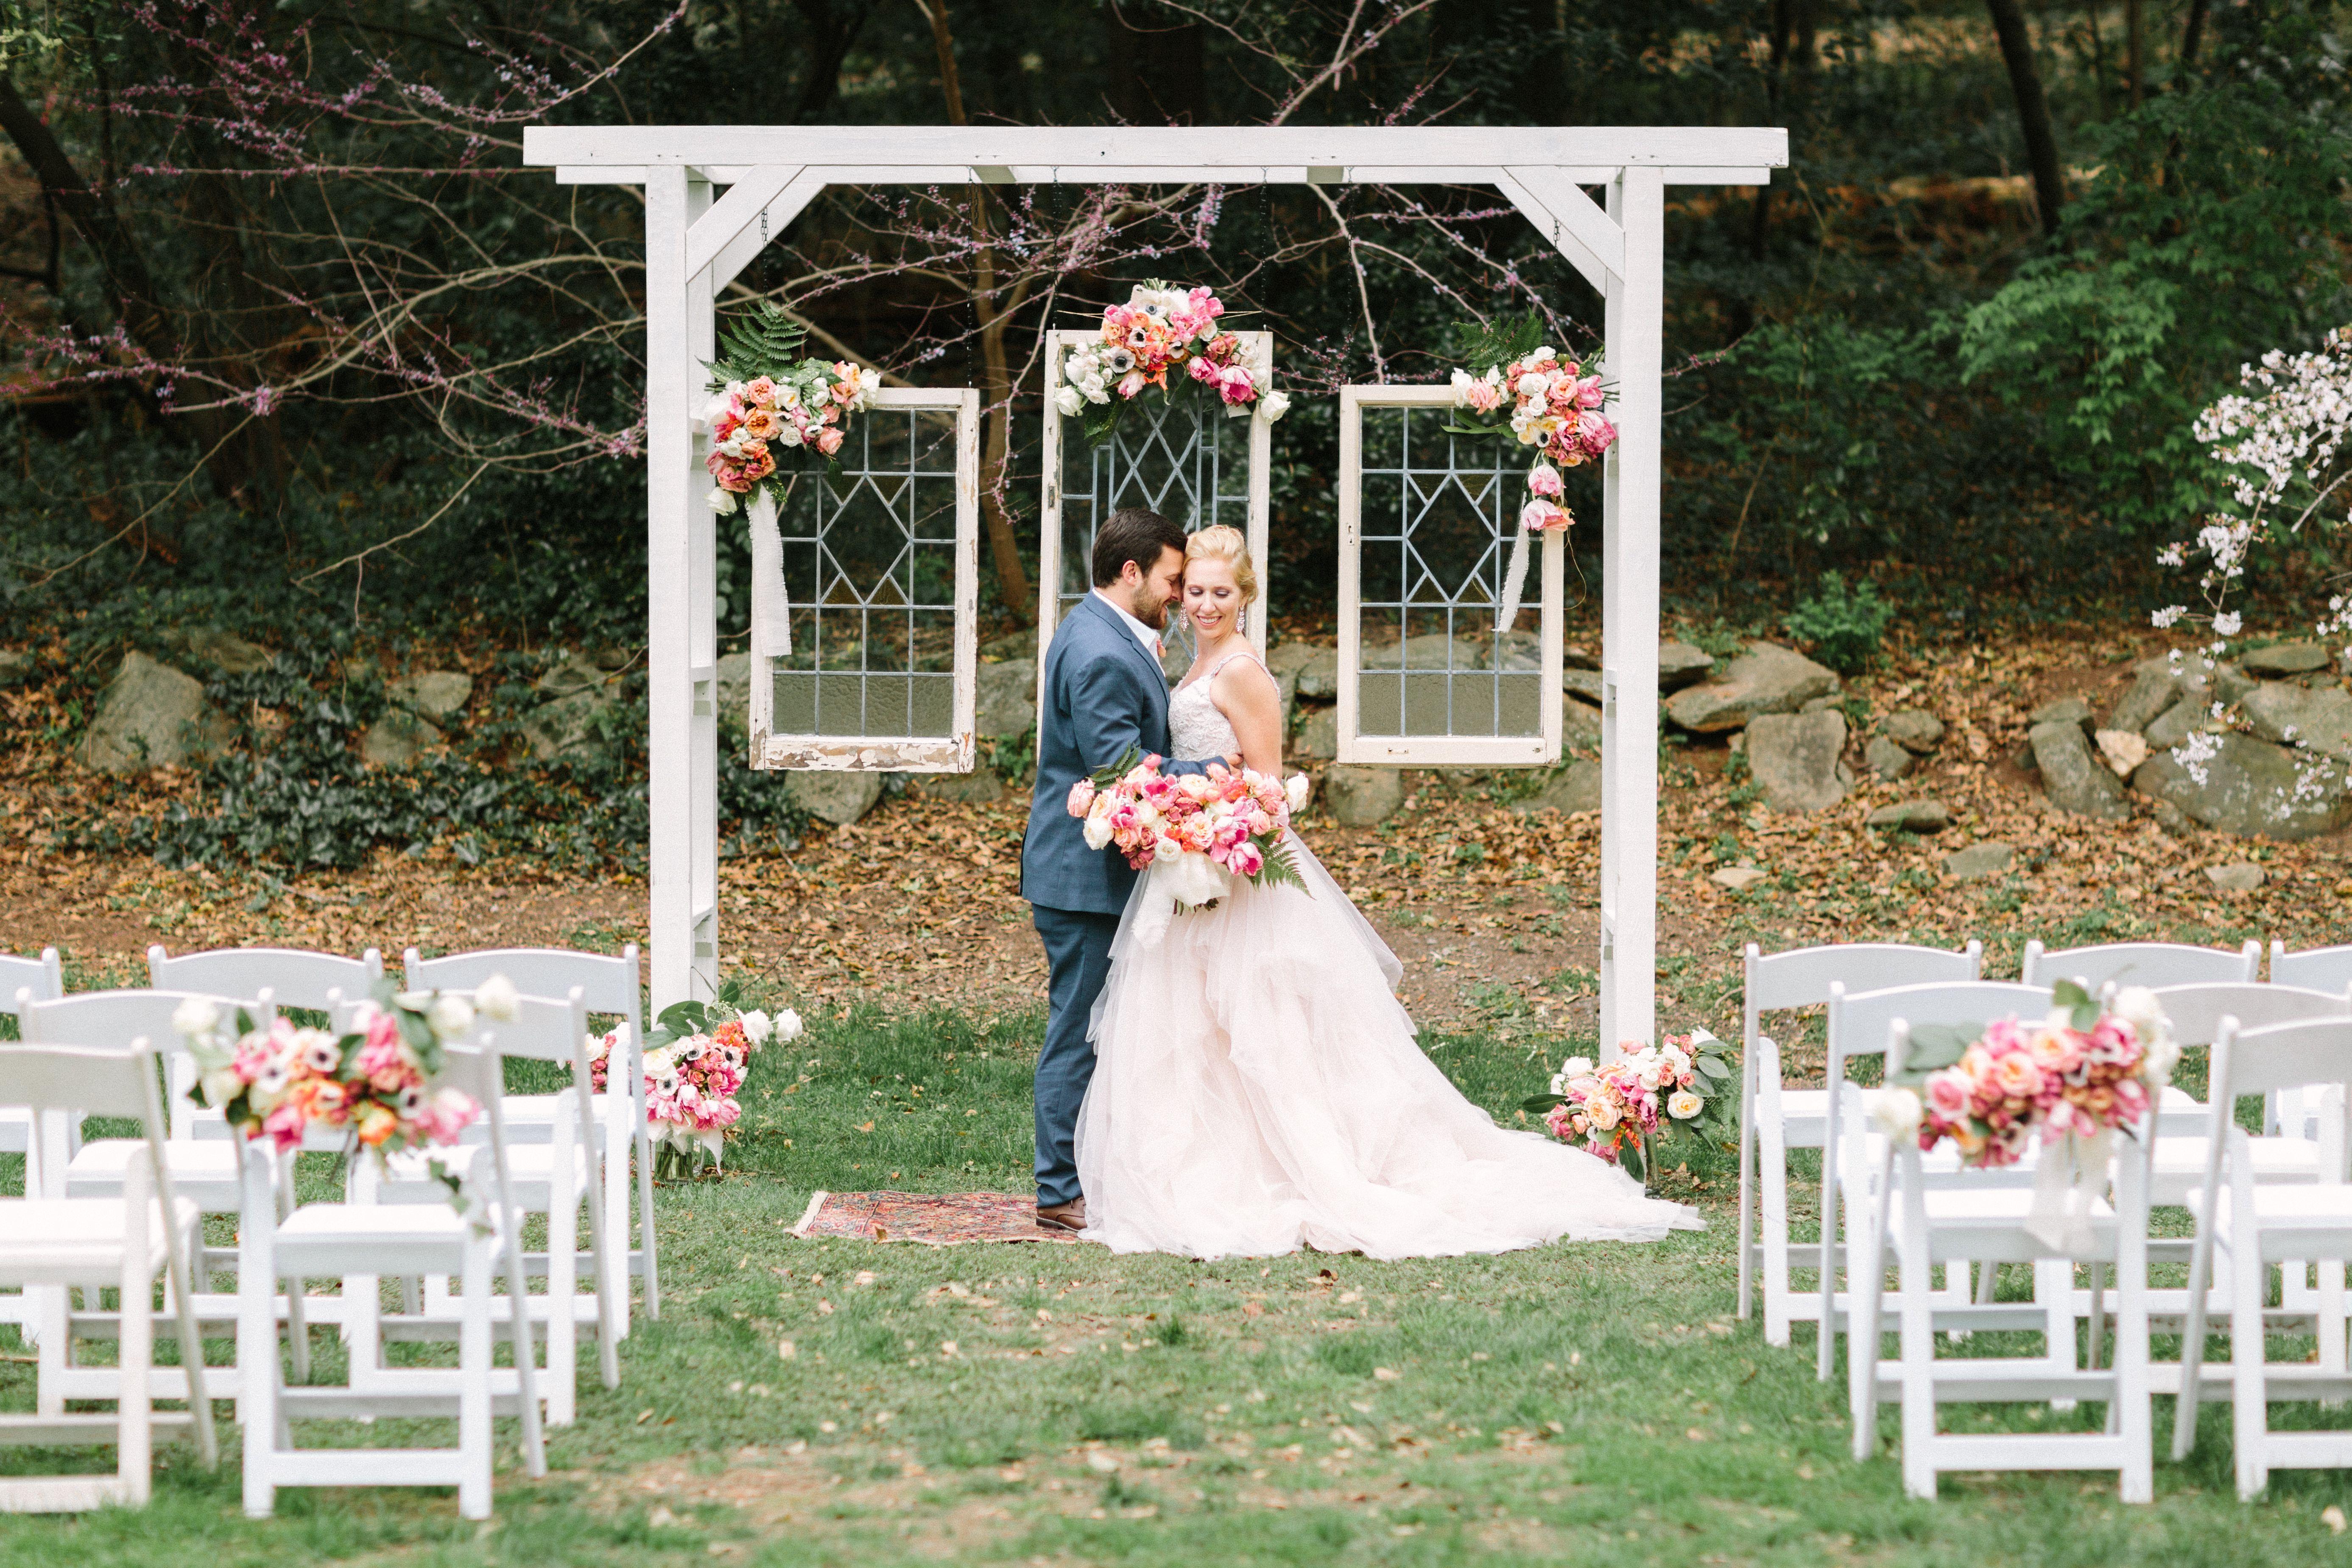 Wedding Ceremony Arbor Vintage Wedding Ceremony Decorations Wedding Alters Wedding Ceremony Arch